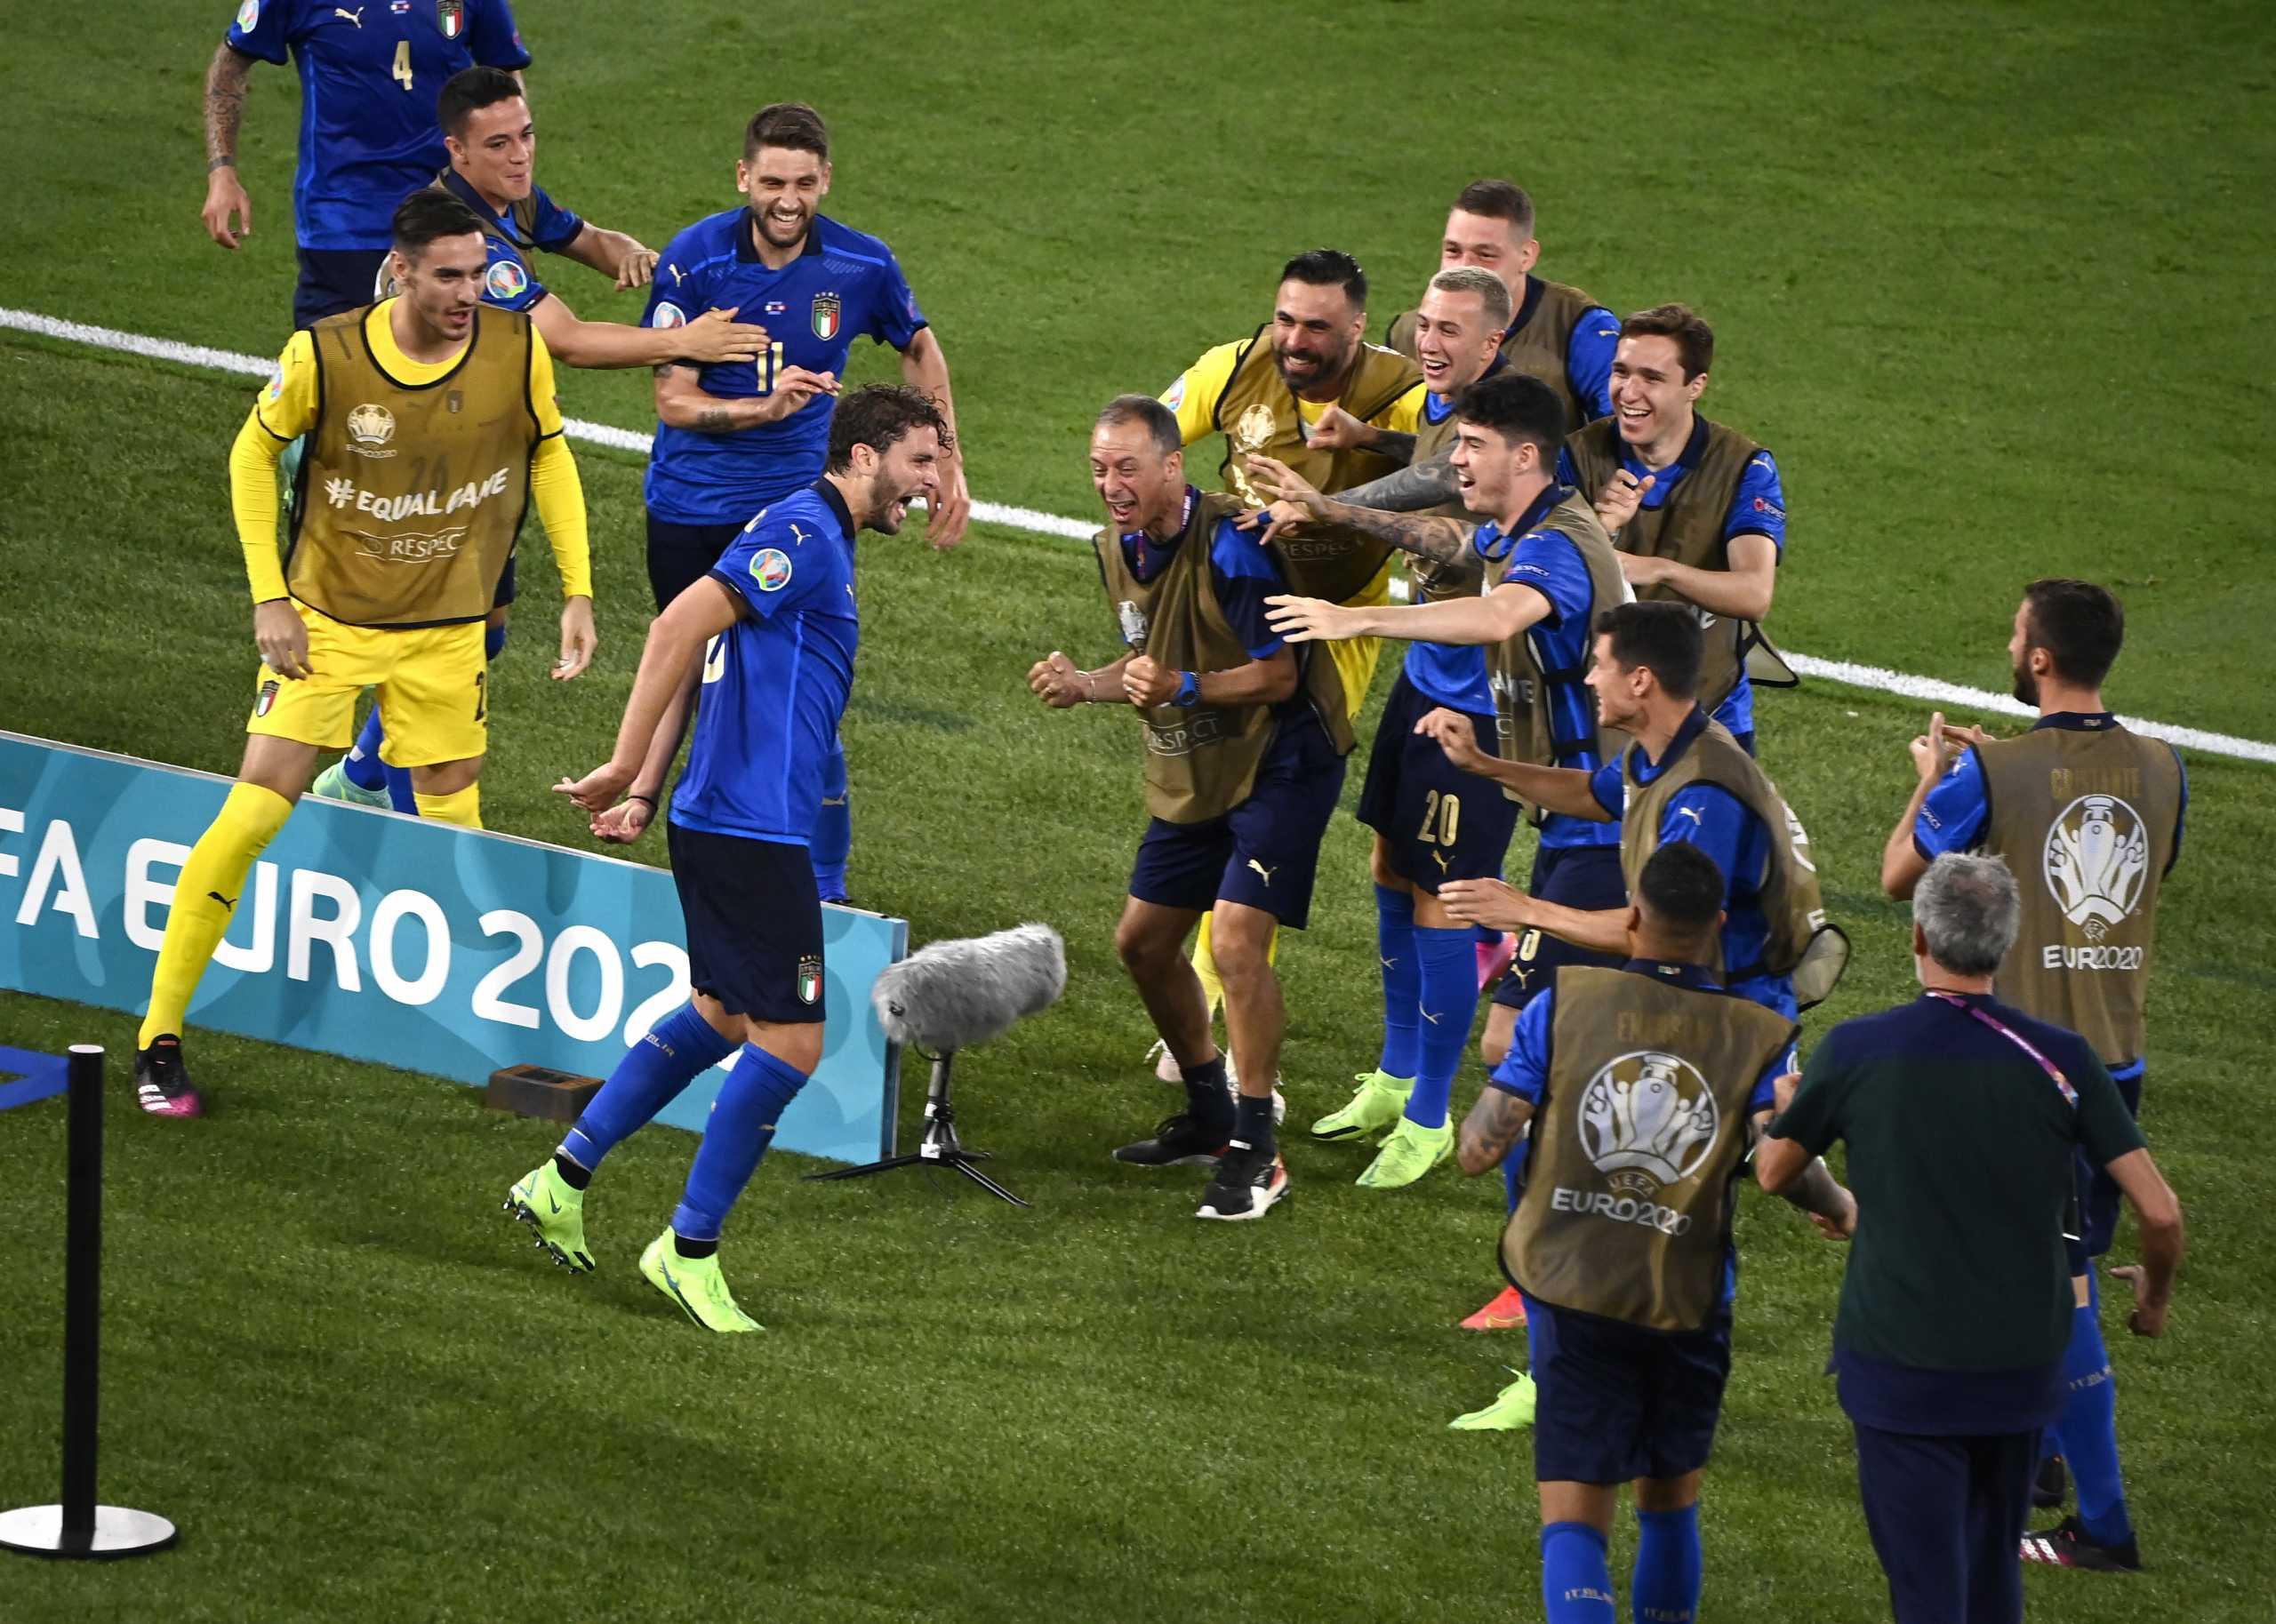 Euro 2020: Φοβεροί Ιταλοί, έκρυψαν την μπάλα και την εμφάνισαν στα δίχτυα της Ελβετίας